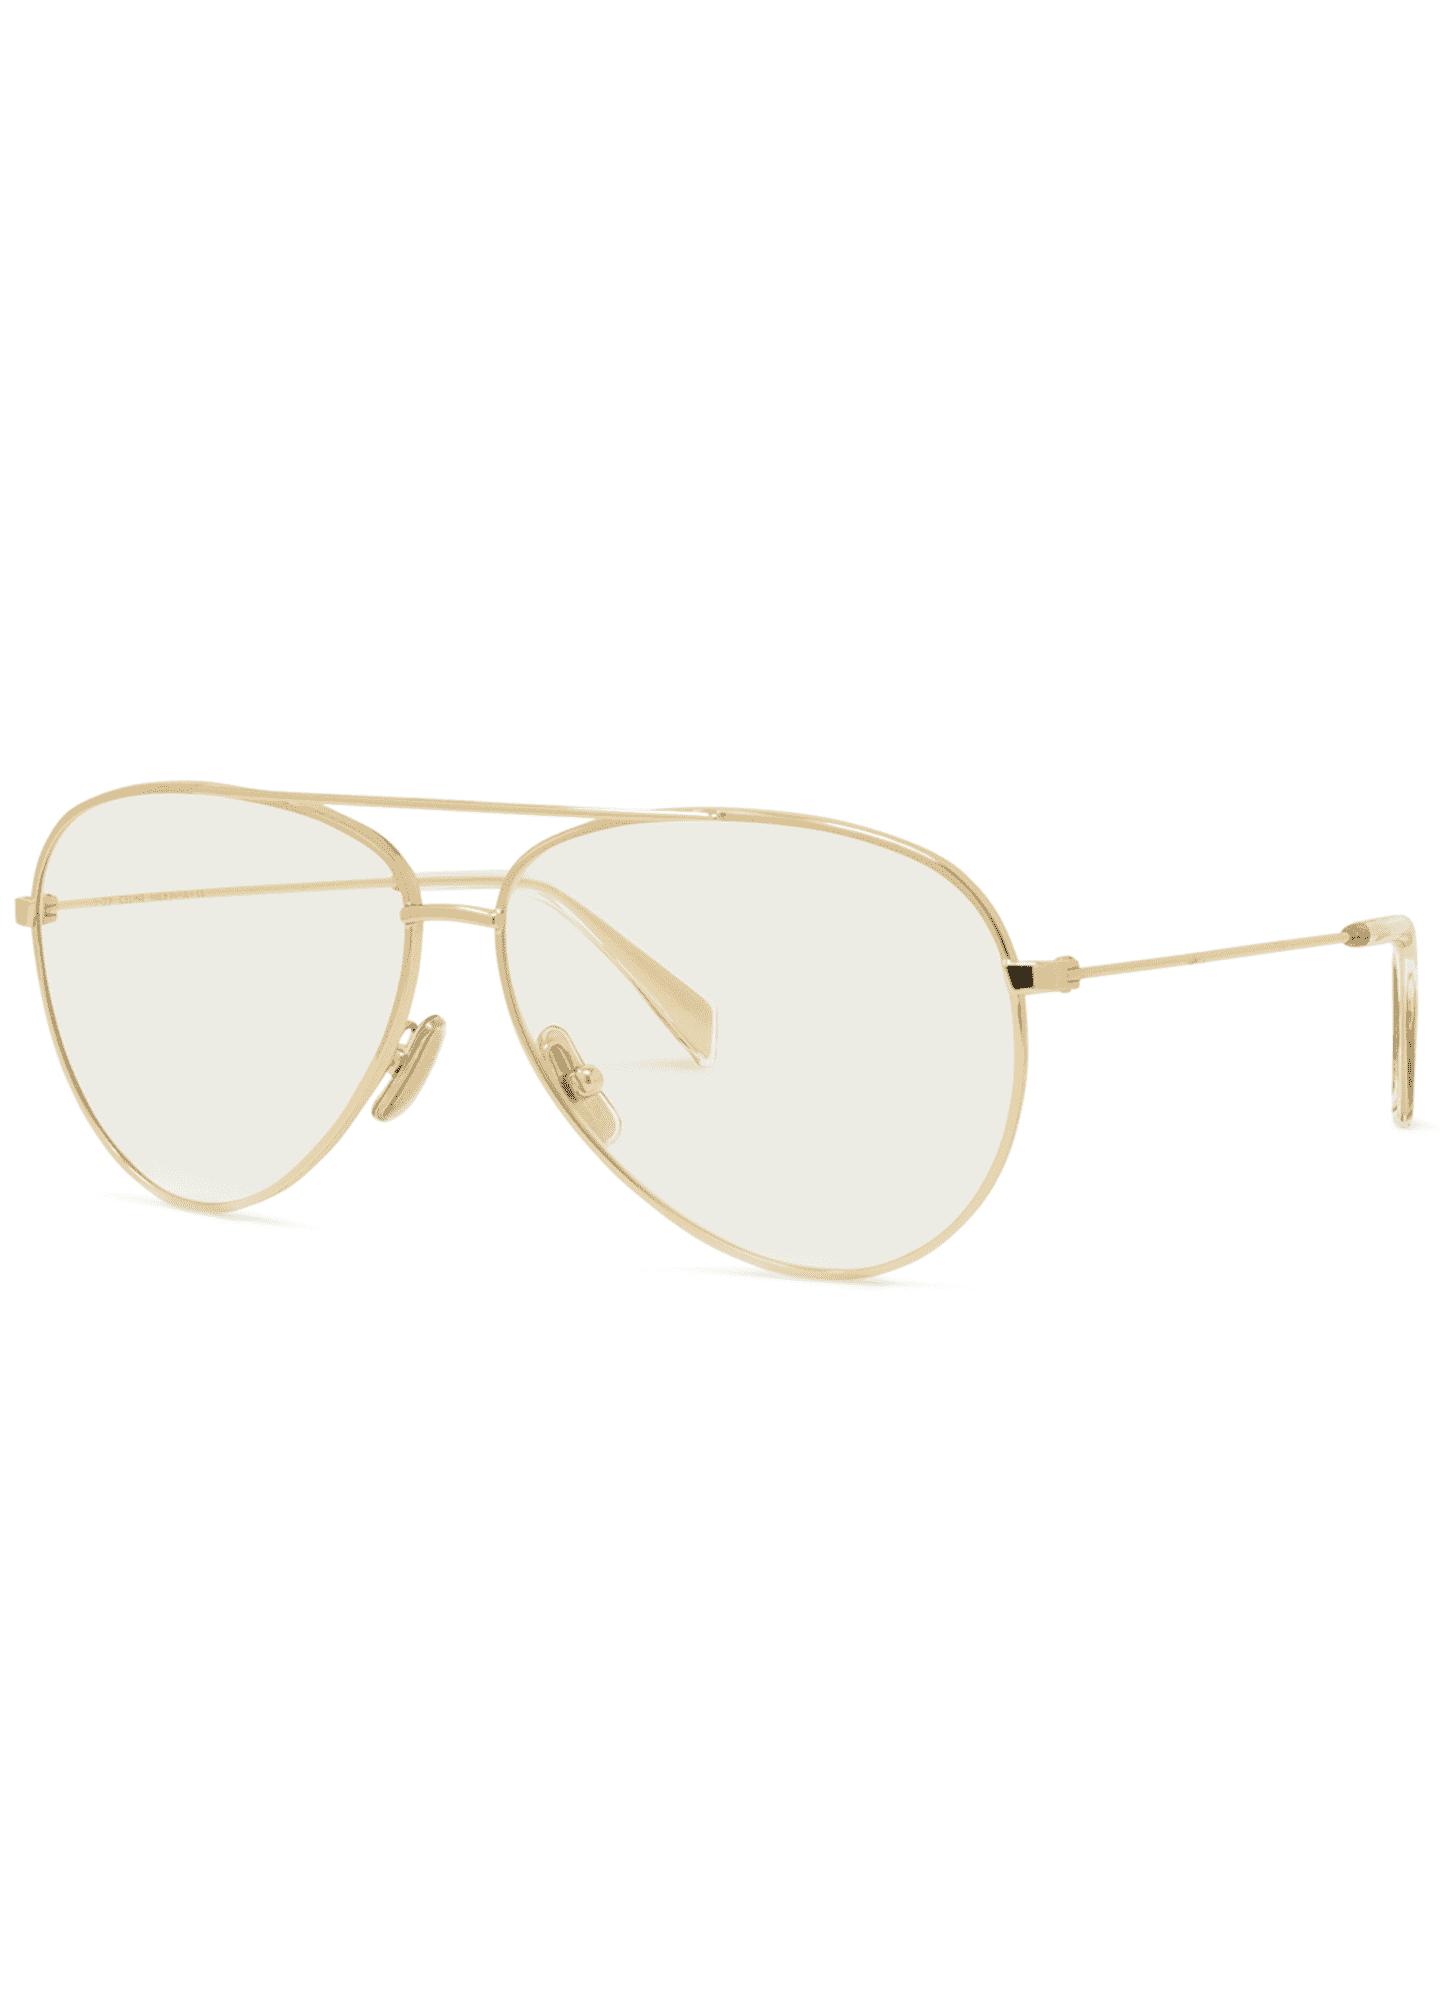 Celine Aviator Gradient Sunglasses